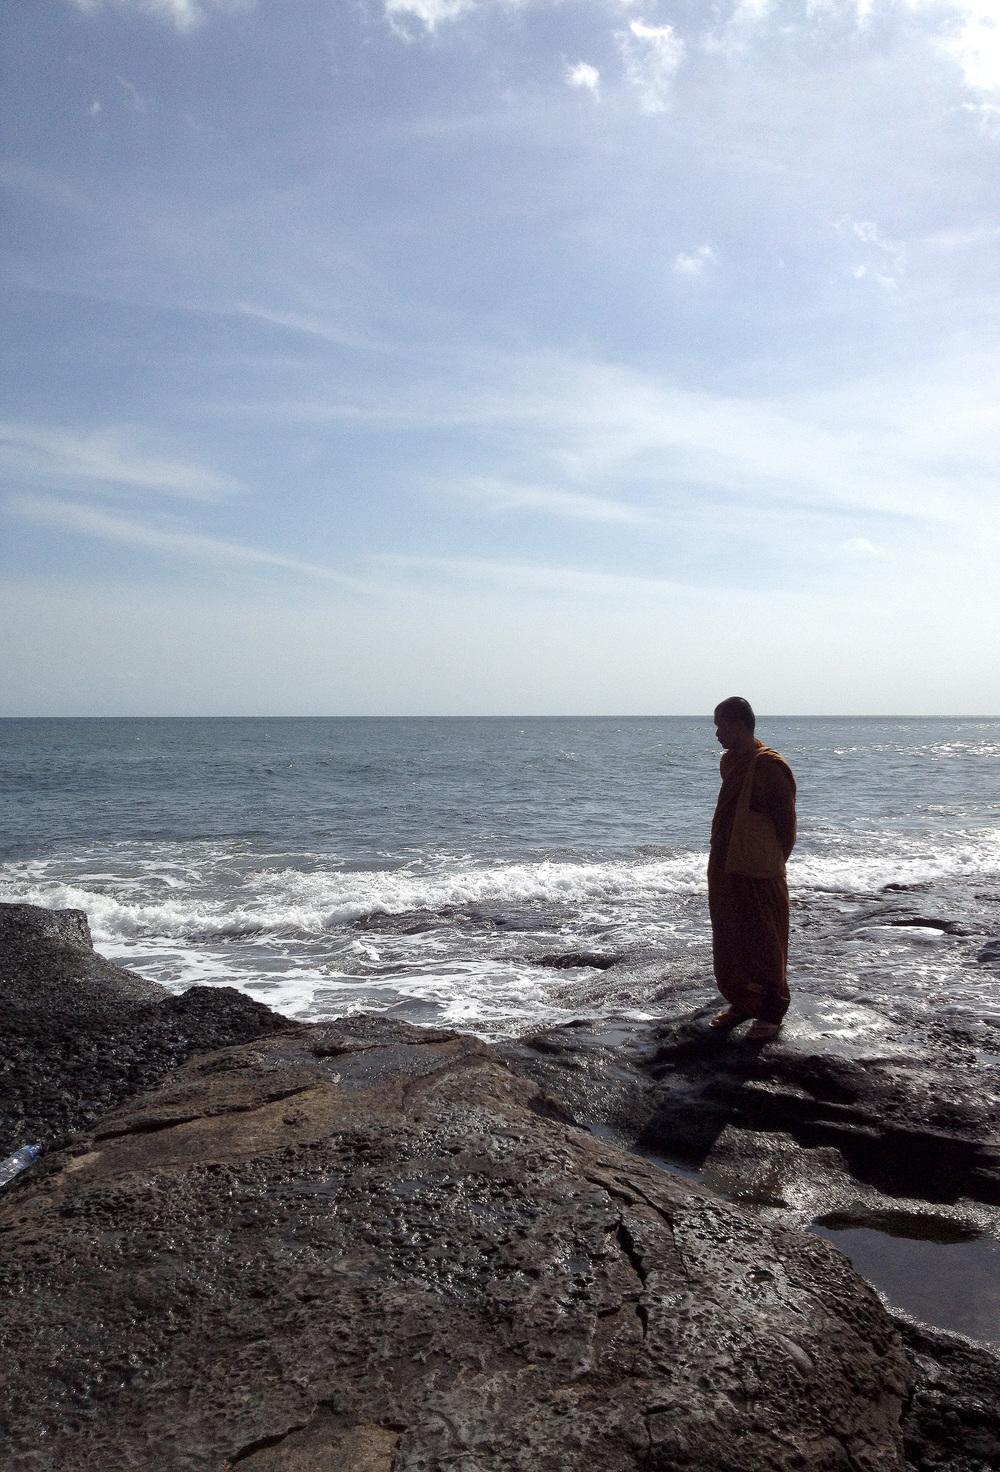 Buddhist in Bali, Indonesia